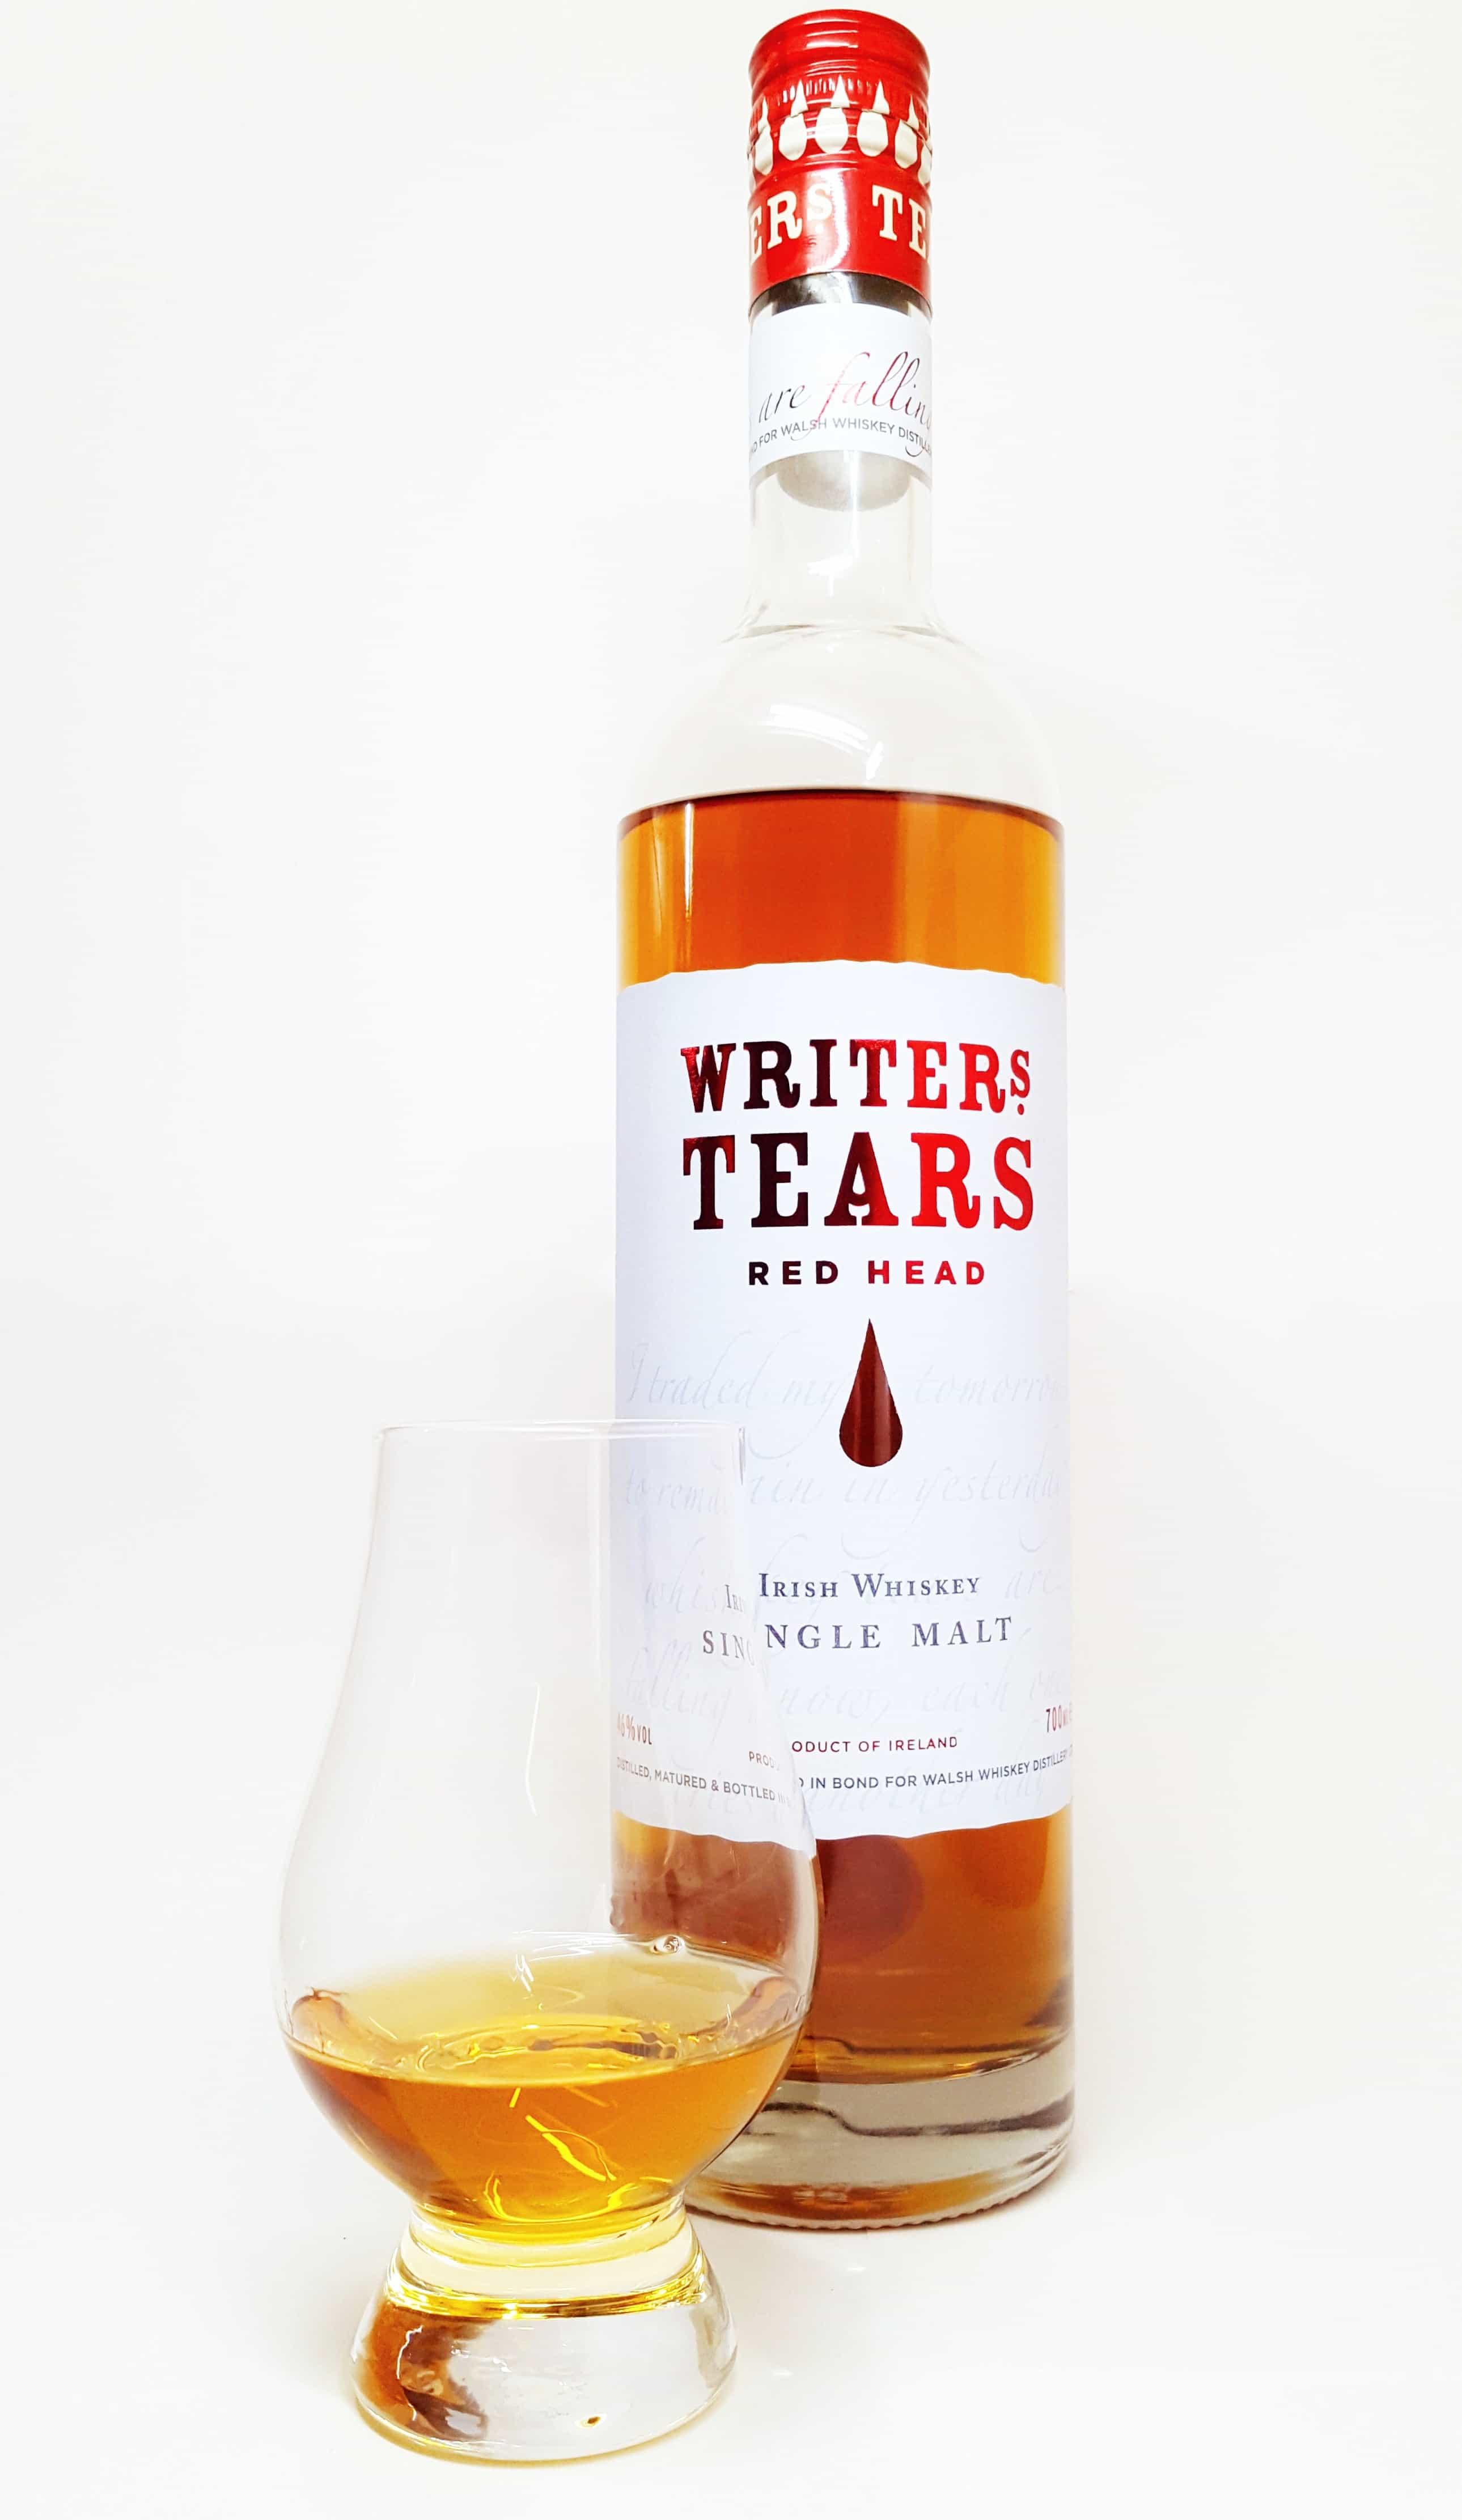 Writers' Tears Red Head